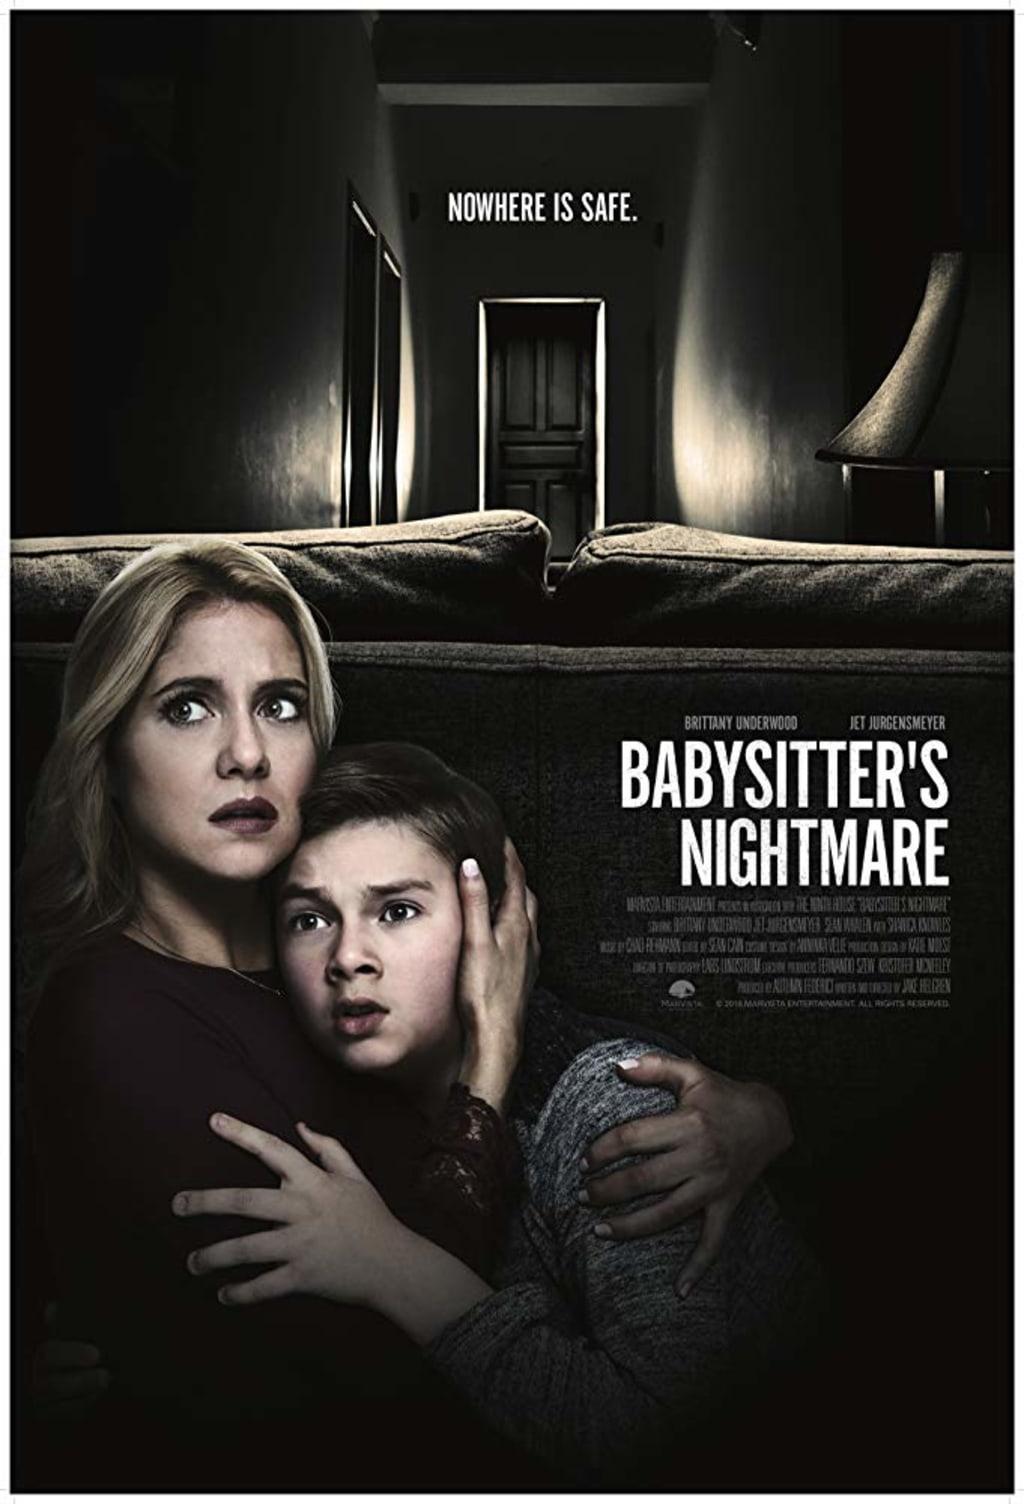 Lifetime Review: 'Babysitter's Nightmare'